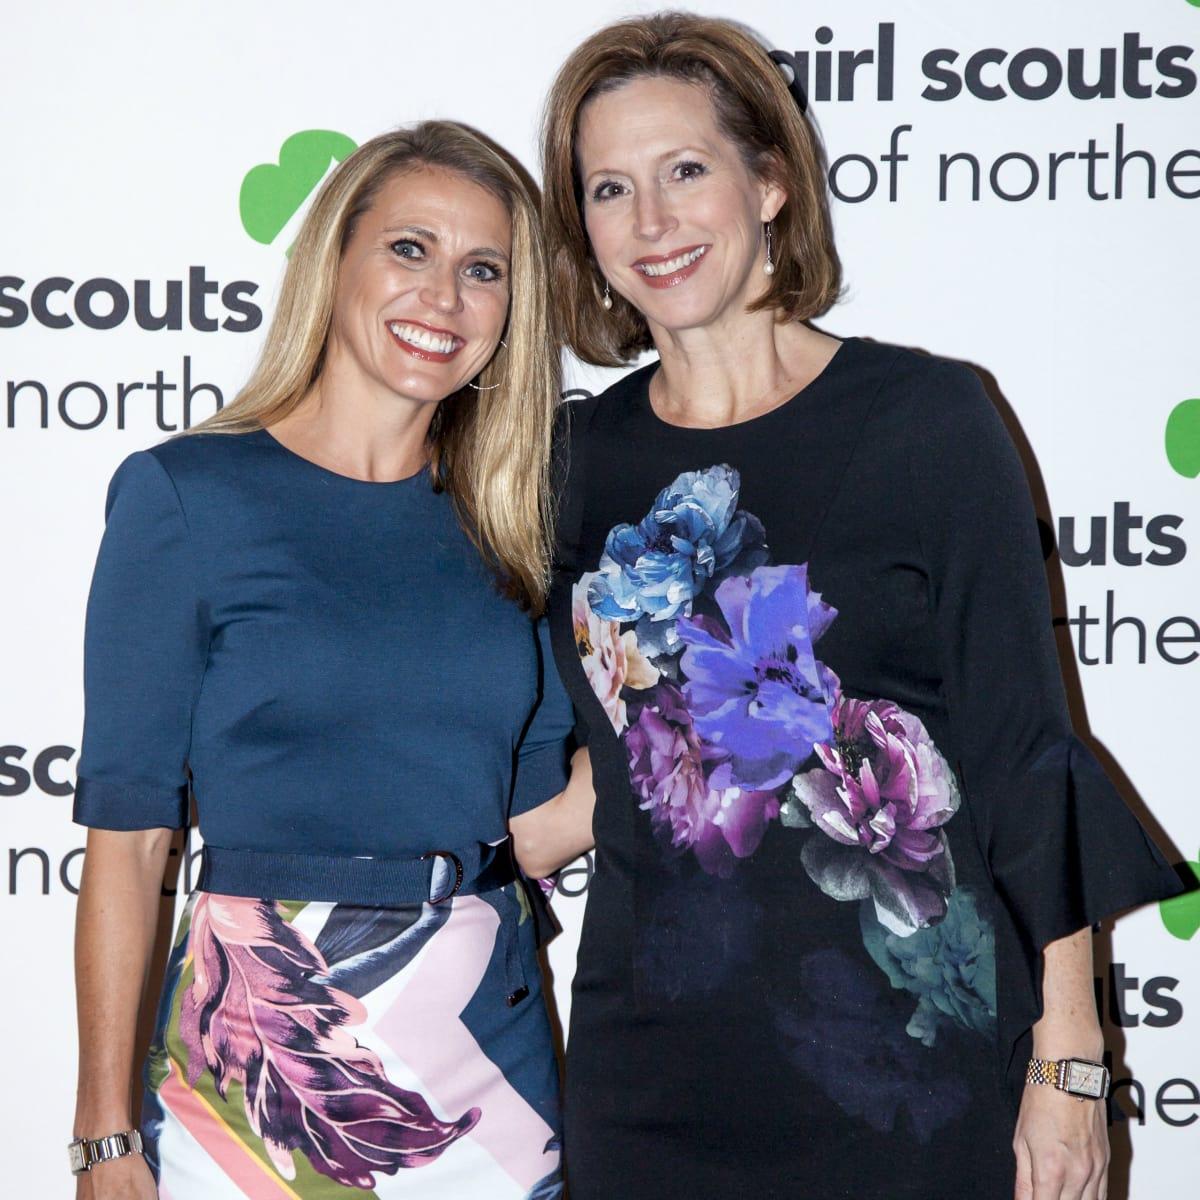 Susan Glassmoyer, Laura Downing